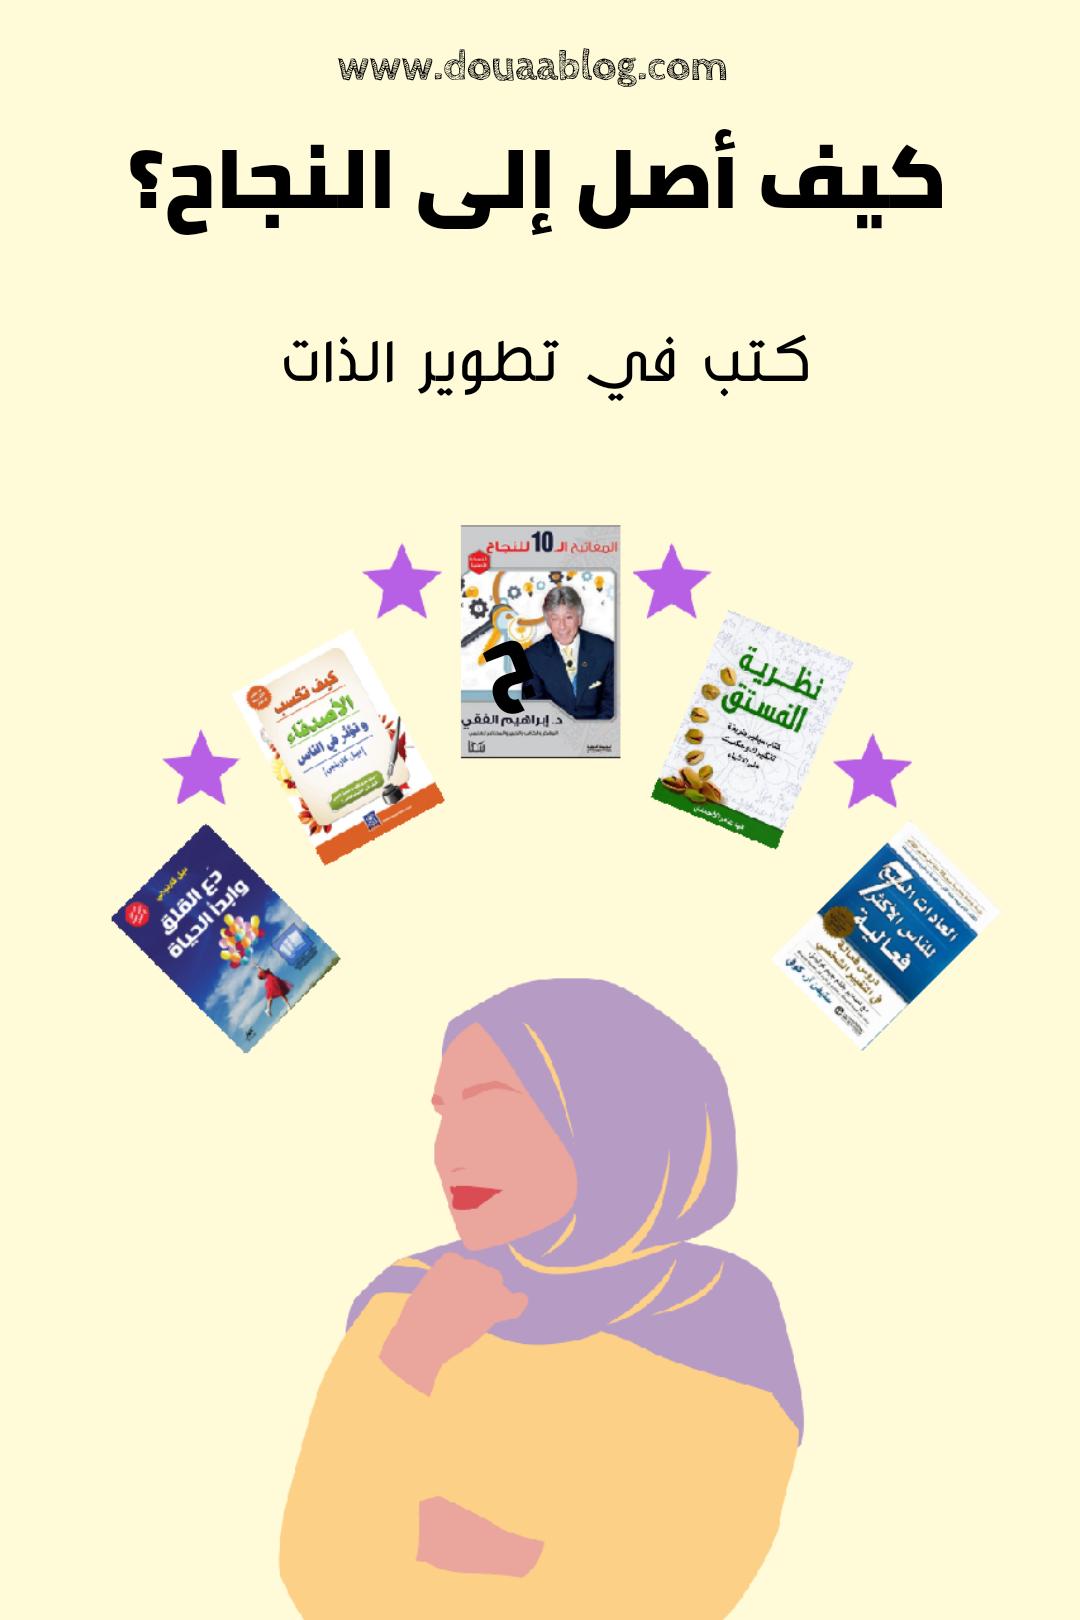 كتب تطوير الذات Book Club Books Islamic Inspirational Quotes My Books